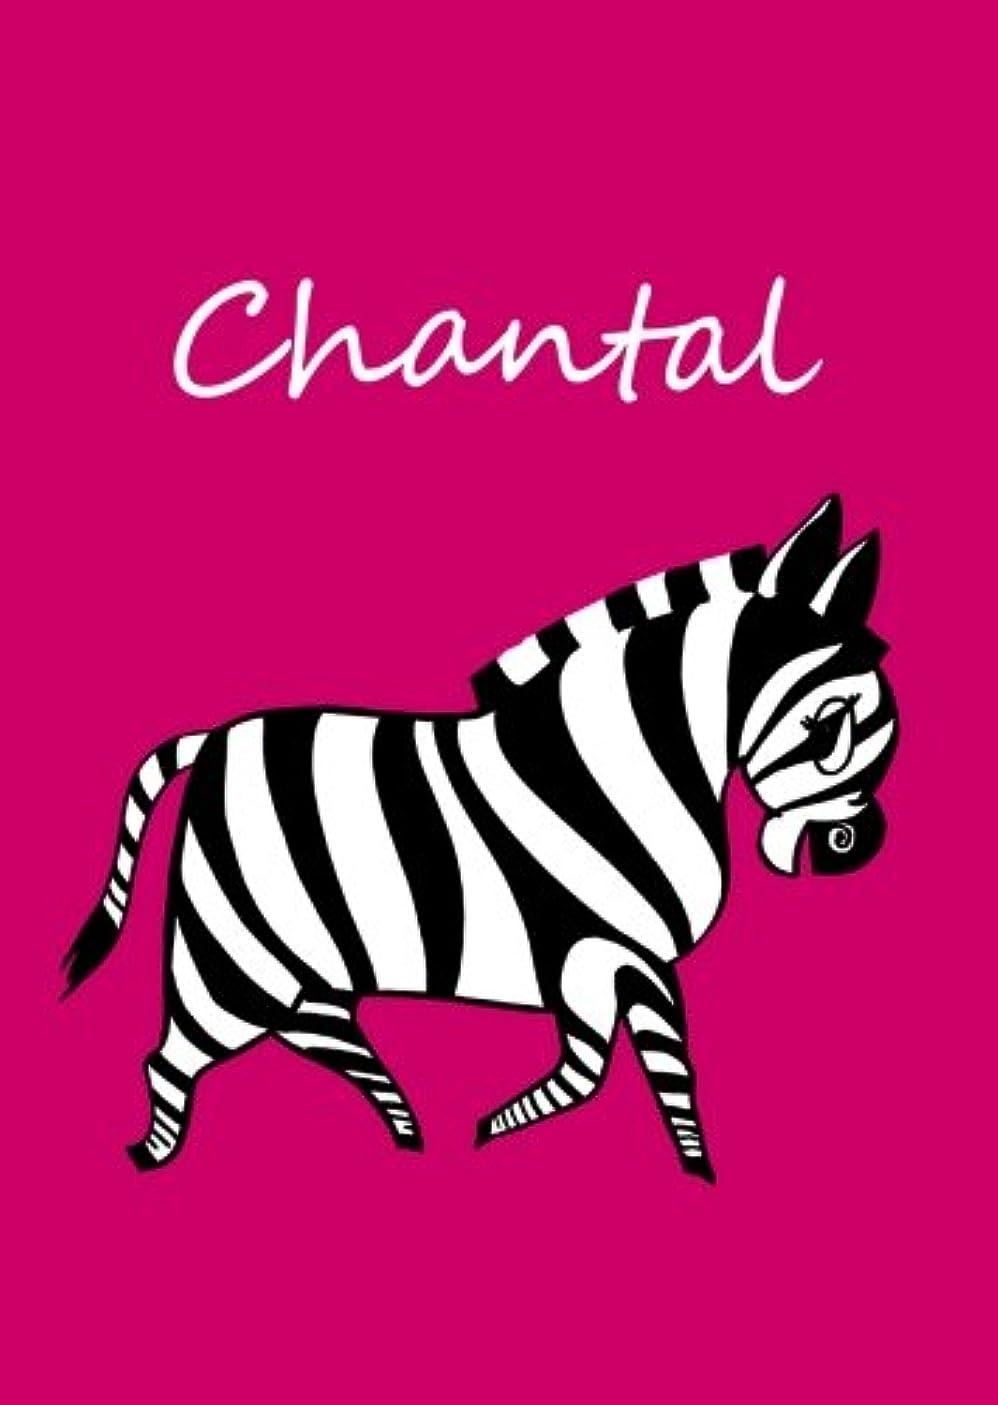 堀暴徒突然personalisiertes Malbuch / Notizbuch / Tagebuch - Chantal: personalisiertes Malbuch / Notizbuch / Tagebuch - Zebra - A4 - blanko